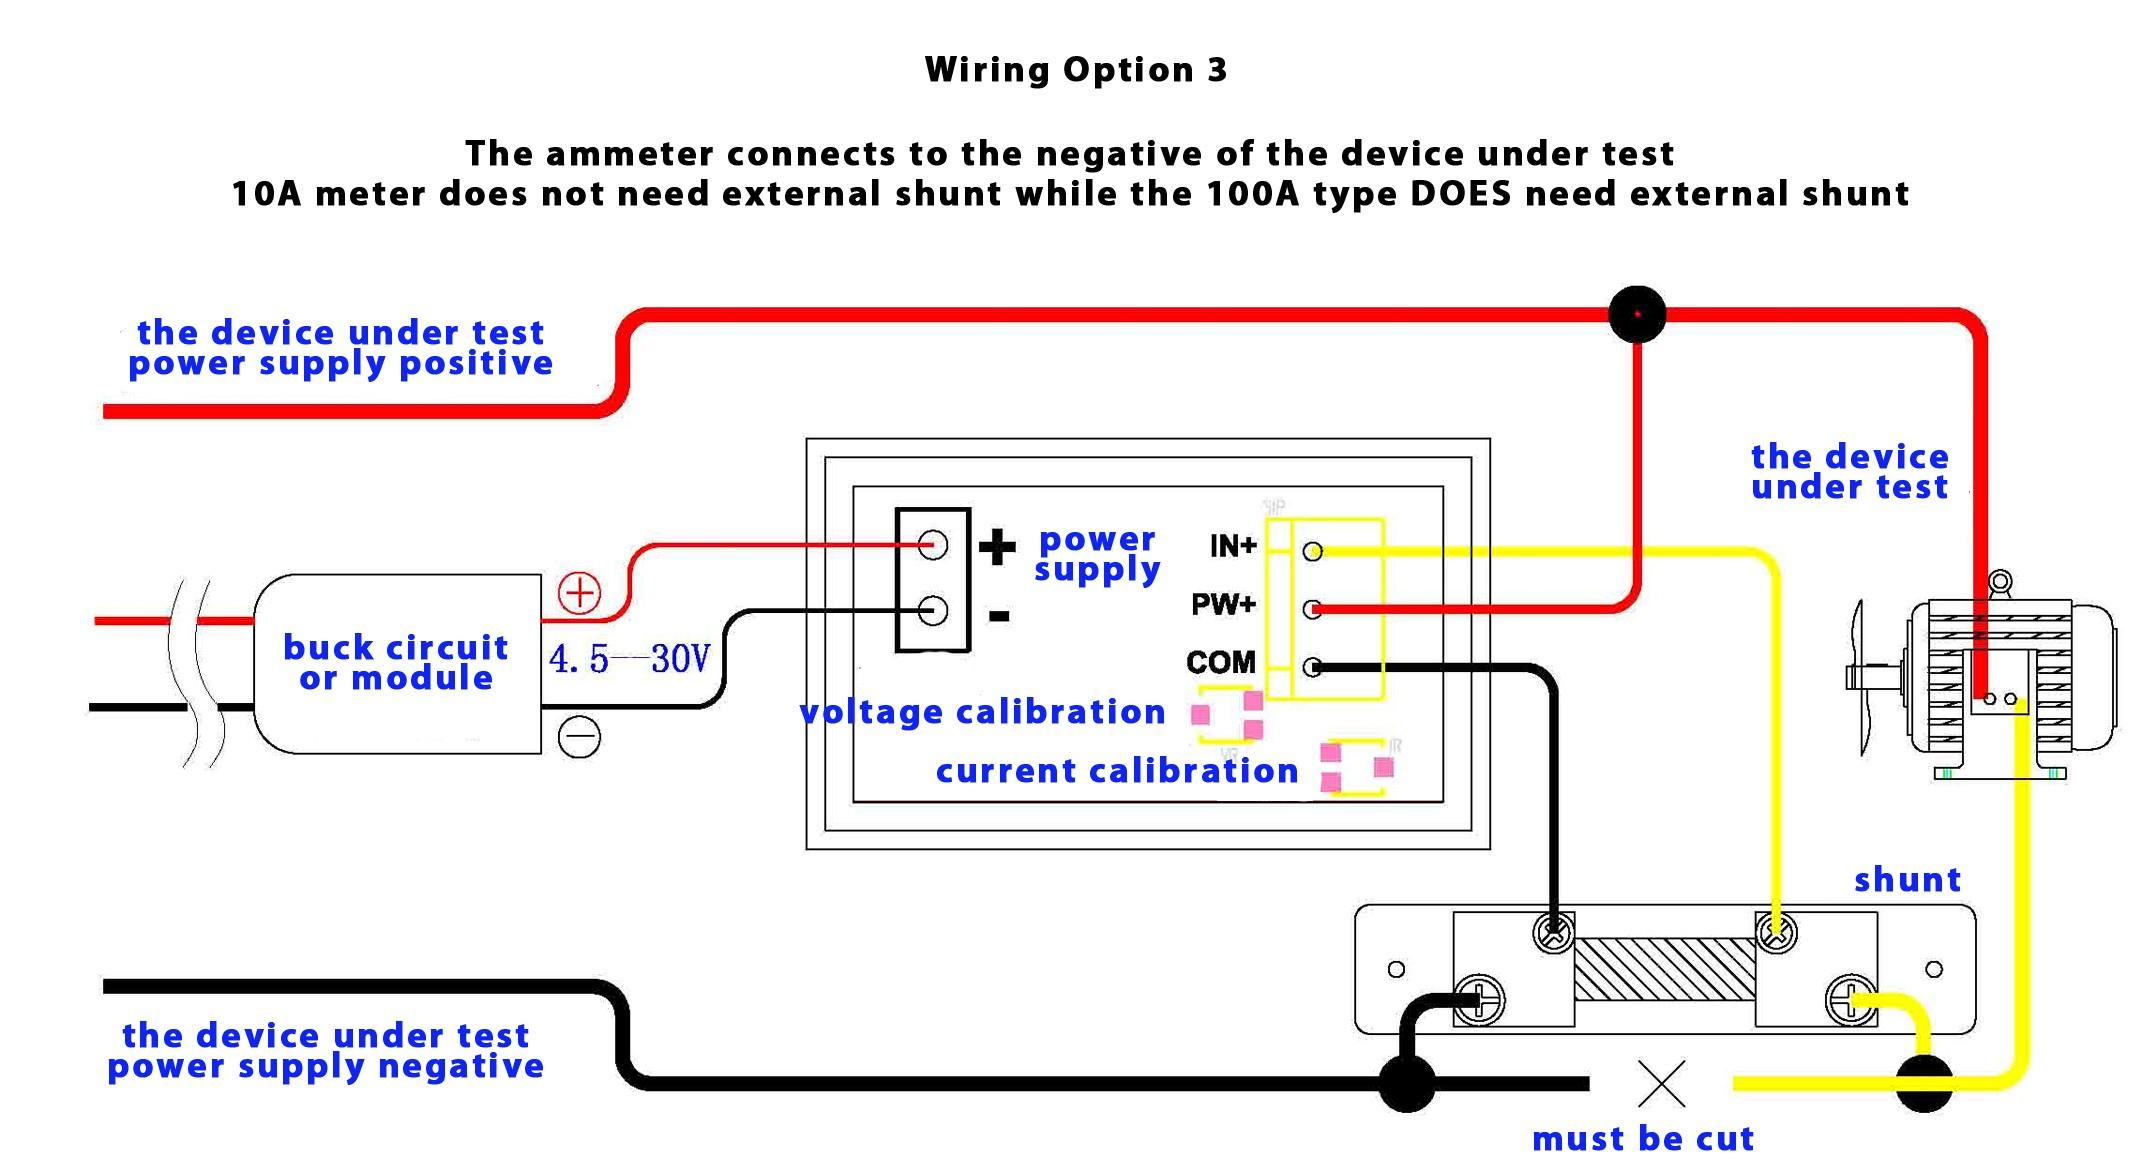 Dual Digital Display Dc Voltmeter & Ammeter 0-100V 0-100A Australia - Digital Volt Amp Meter Wiring Diagram